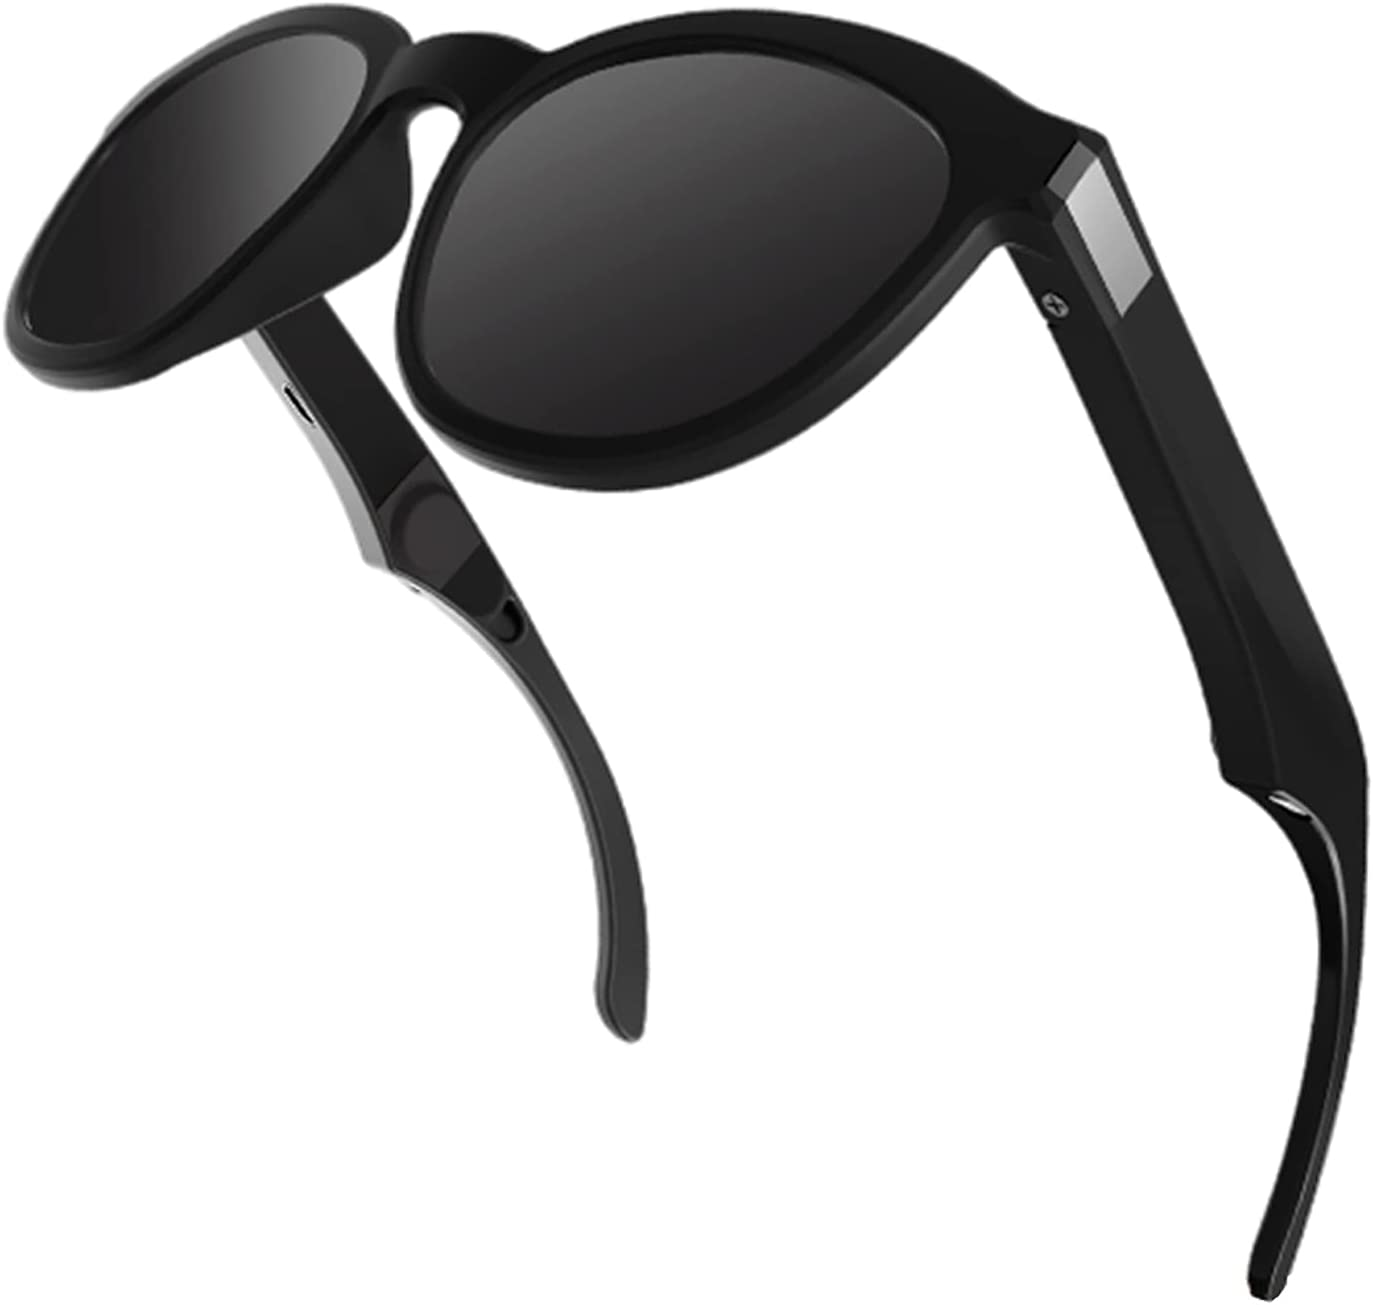 YIJU G4 Bone Conduction Smart Glasses Wireless Bluetooth Sports Headphones for Cycling Driving Calling Music - Black